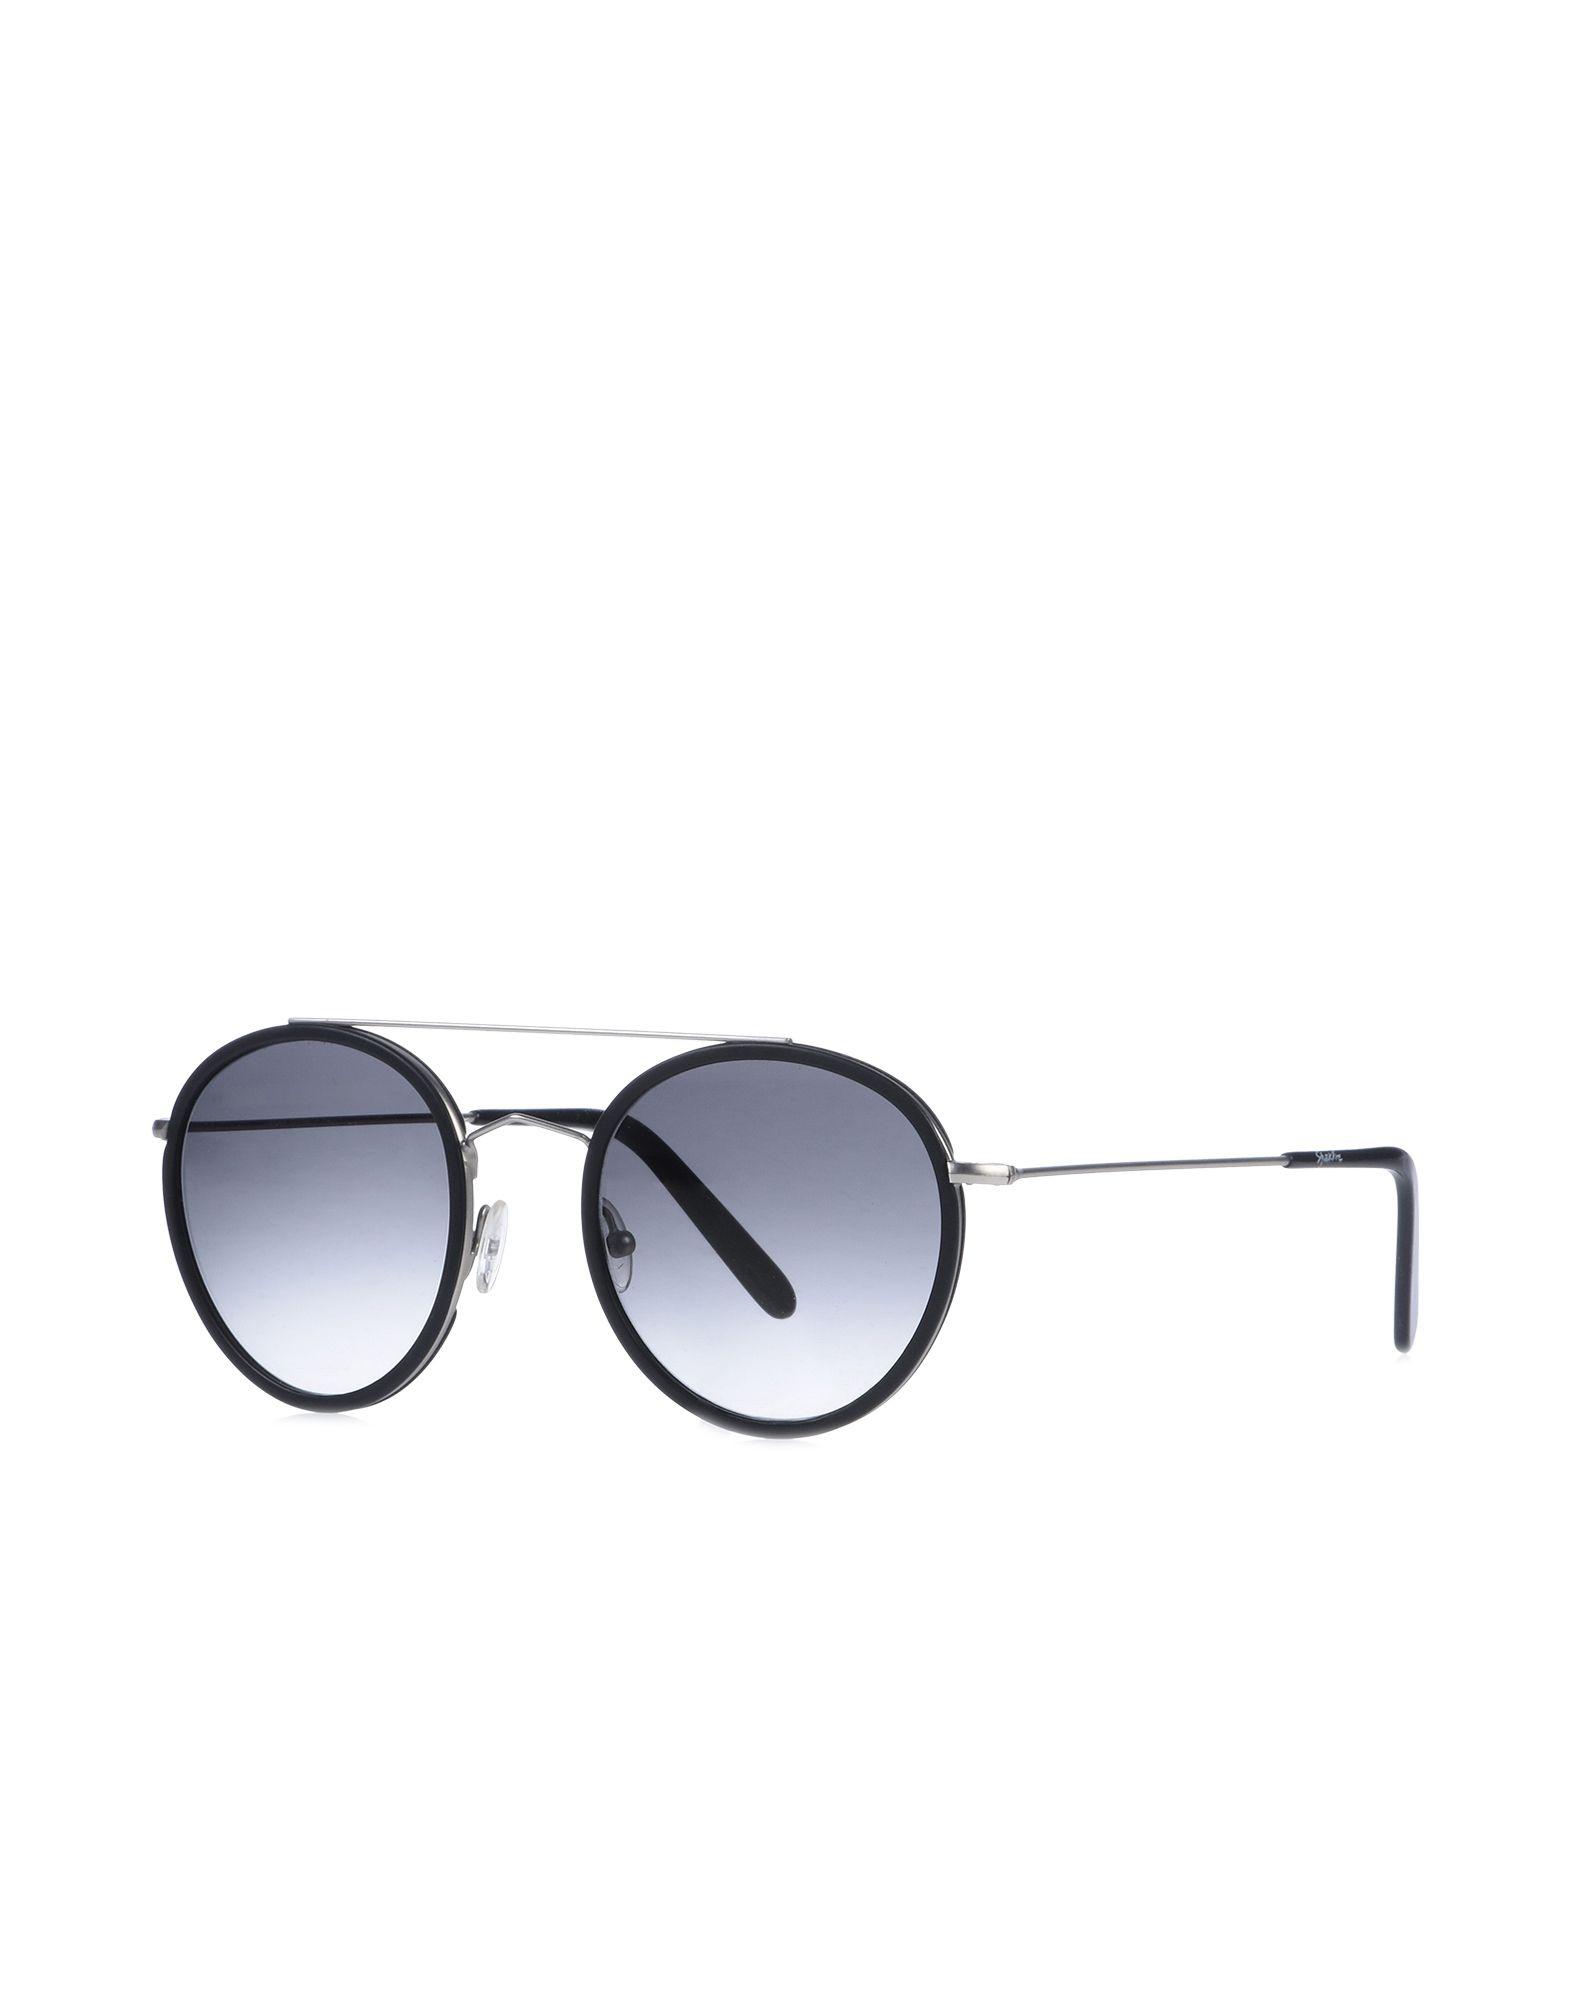 Фото - SPEKTRE Солнечные очки 3d очки